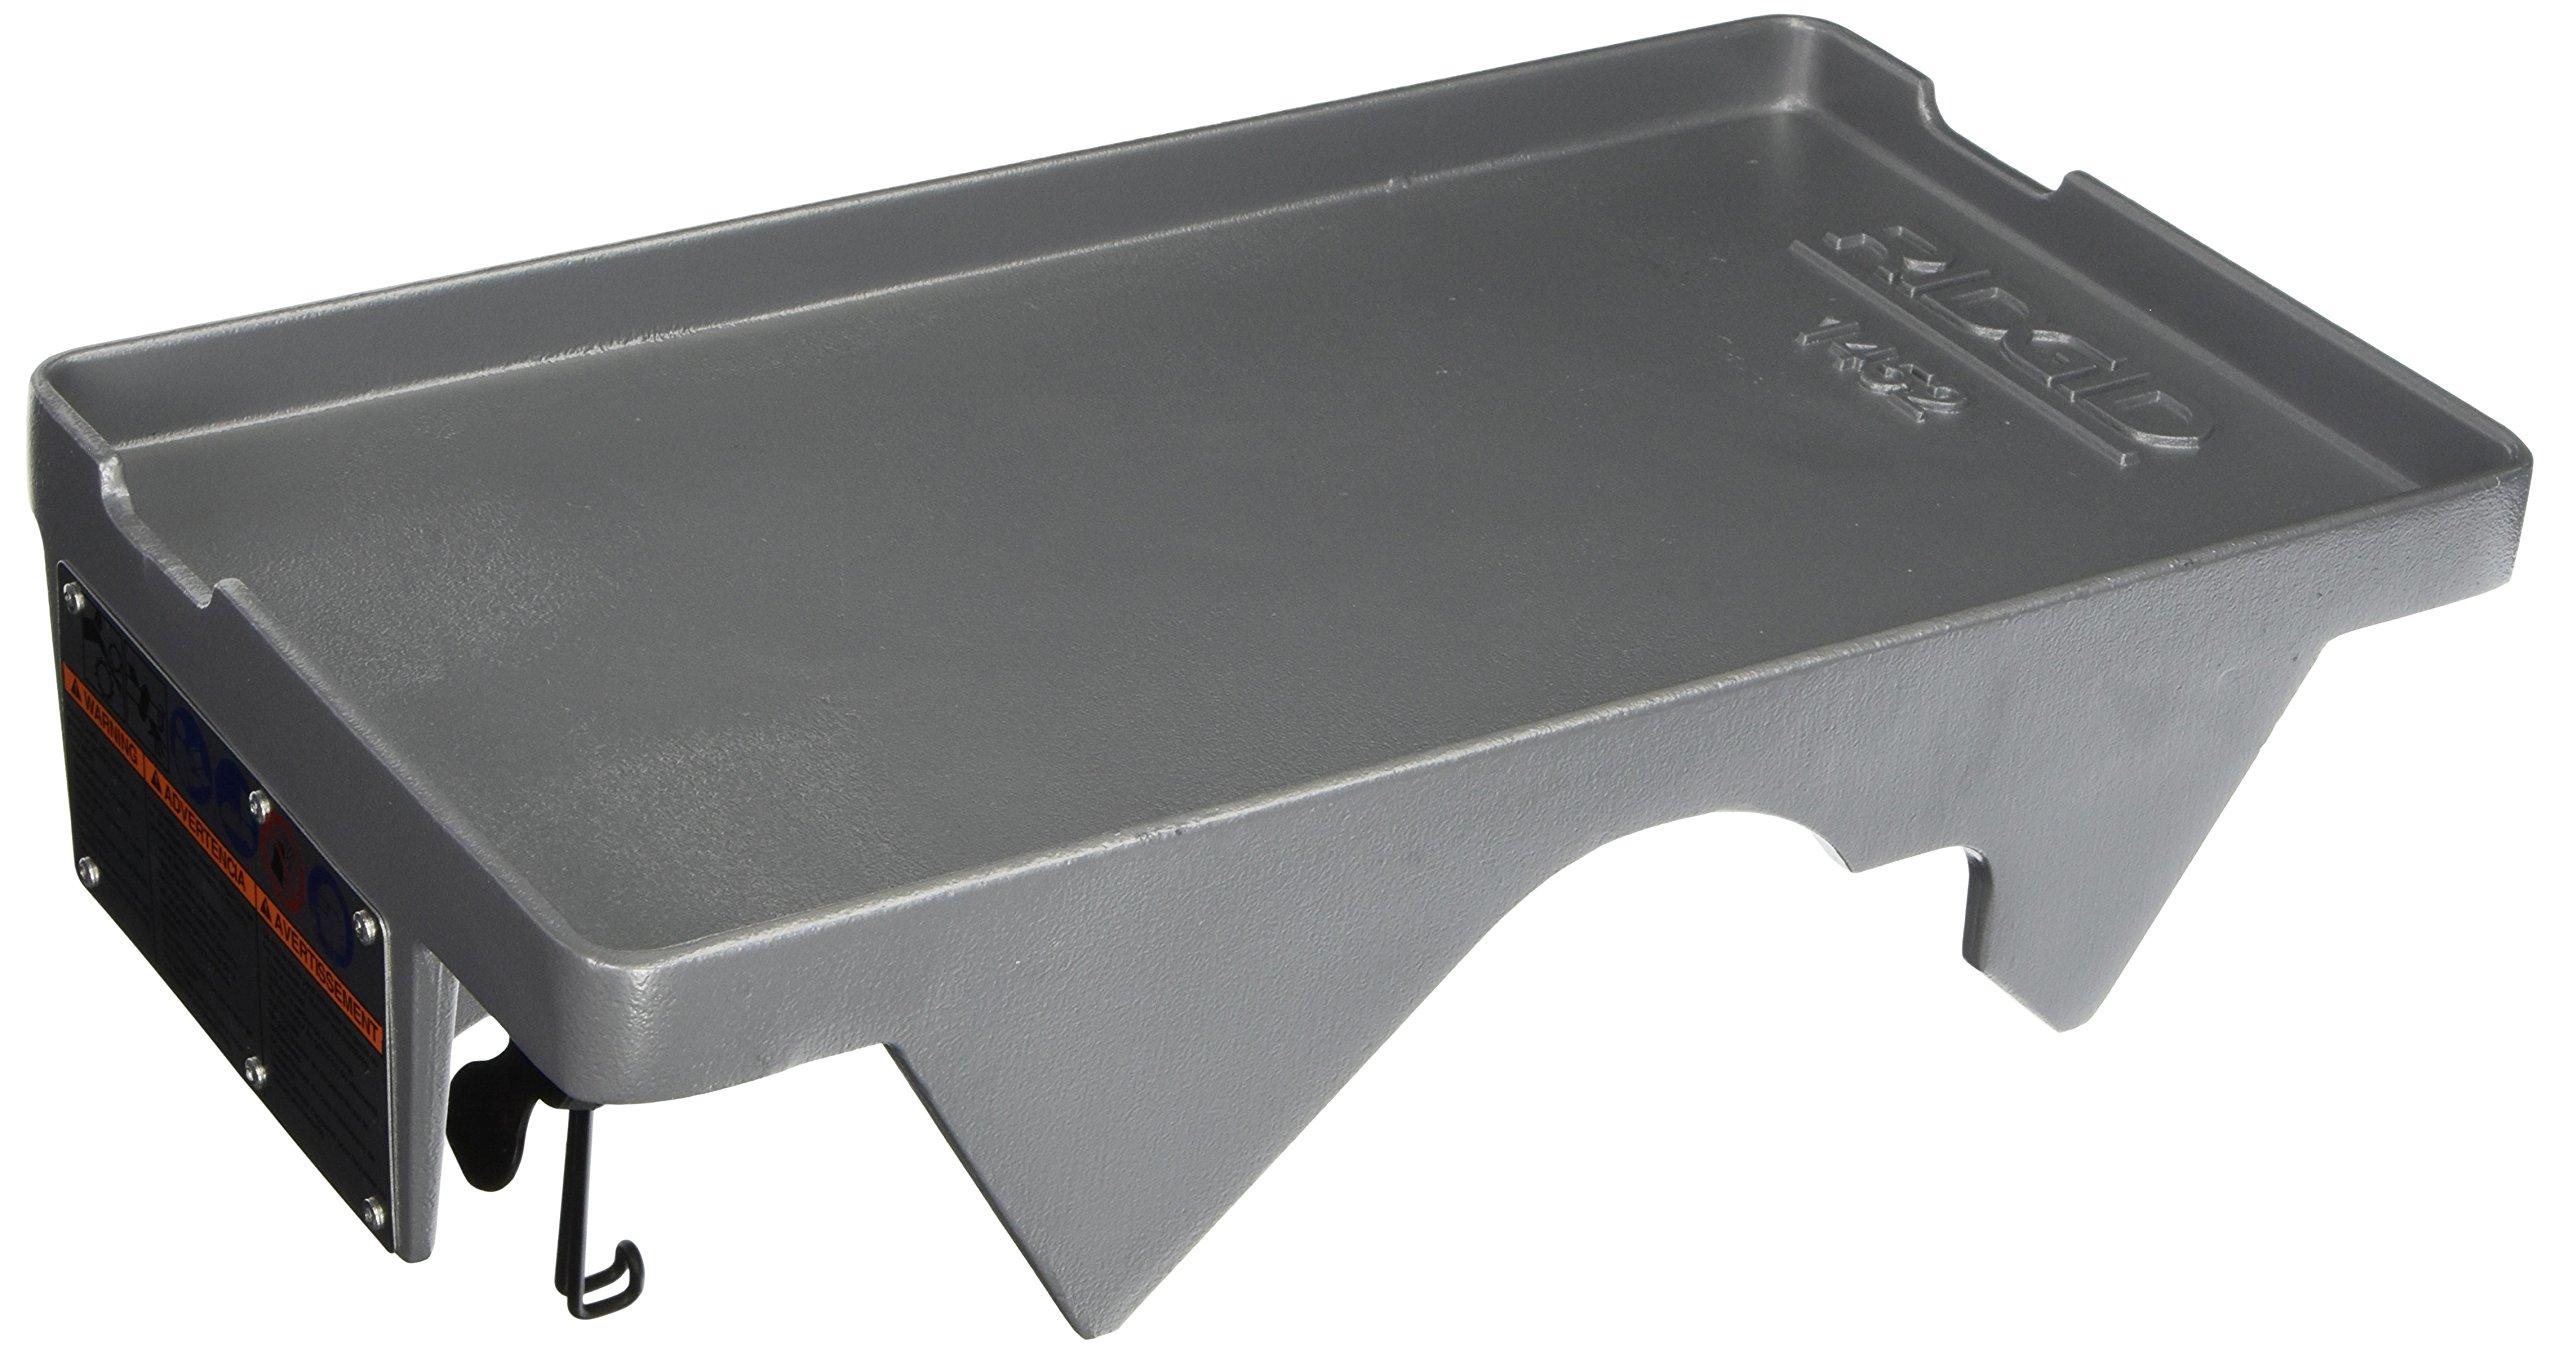 Ridgid 22638 1452 Clip-On Tool Tray by Ridgid